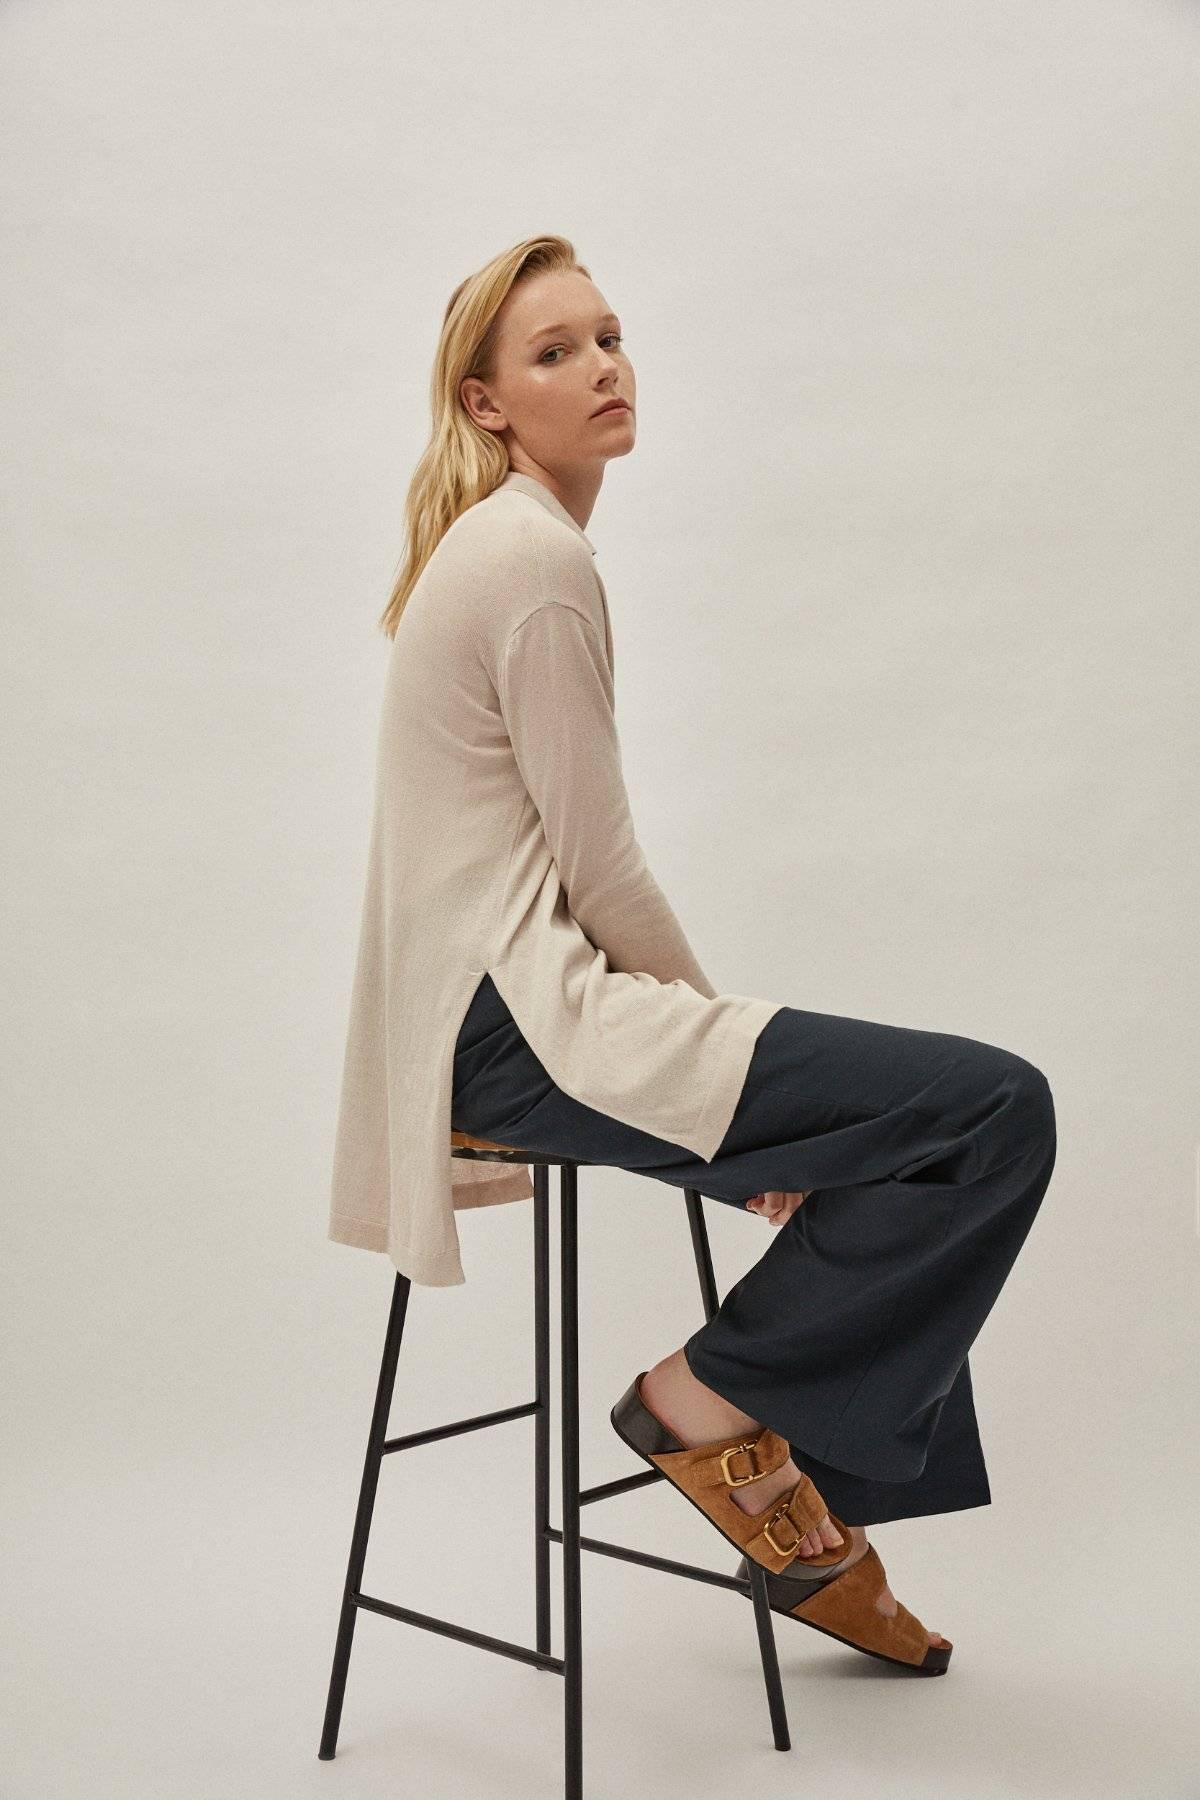 Artknit Studios The Silk Cotton Tunic - Pearl